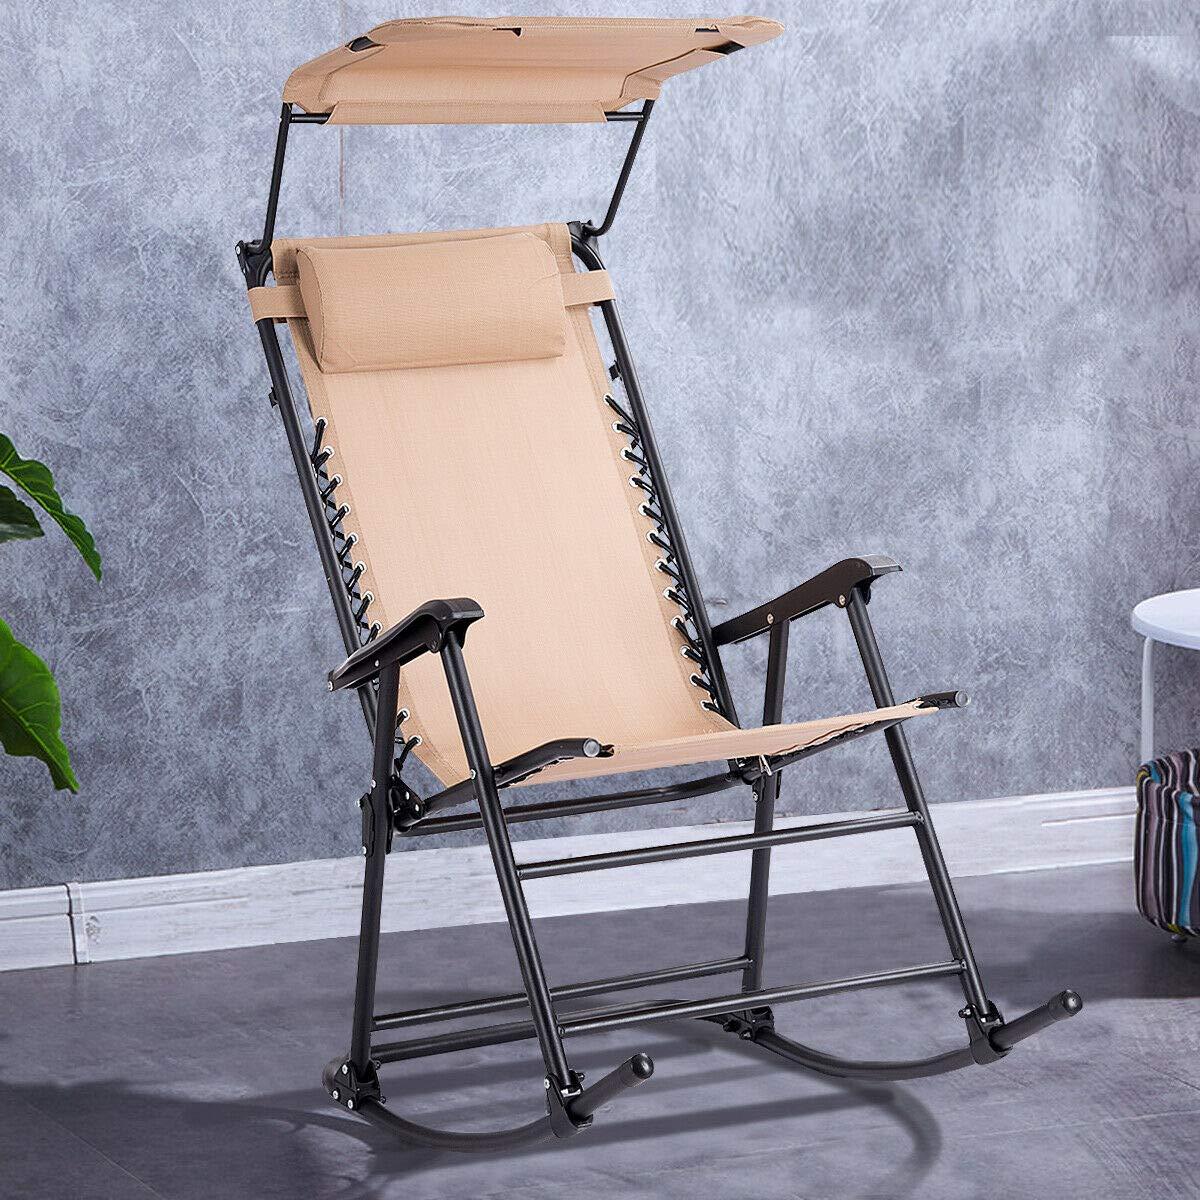 Stark Item Folding Rocking Chair Rocker Porch Zero Gravity Patio Furniture W/Canopy Beige